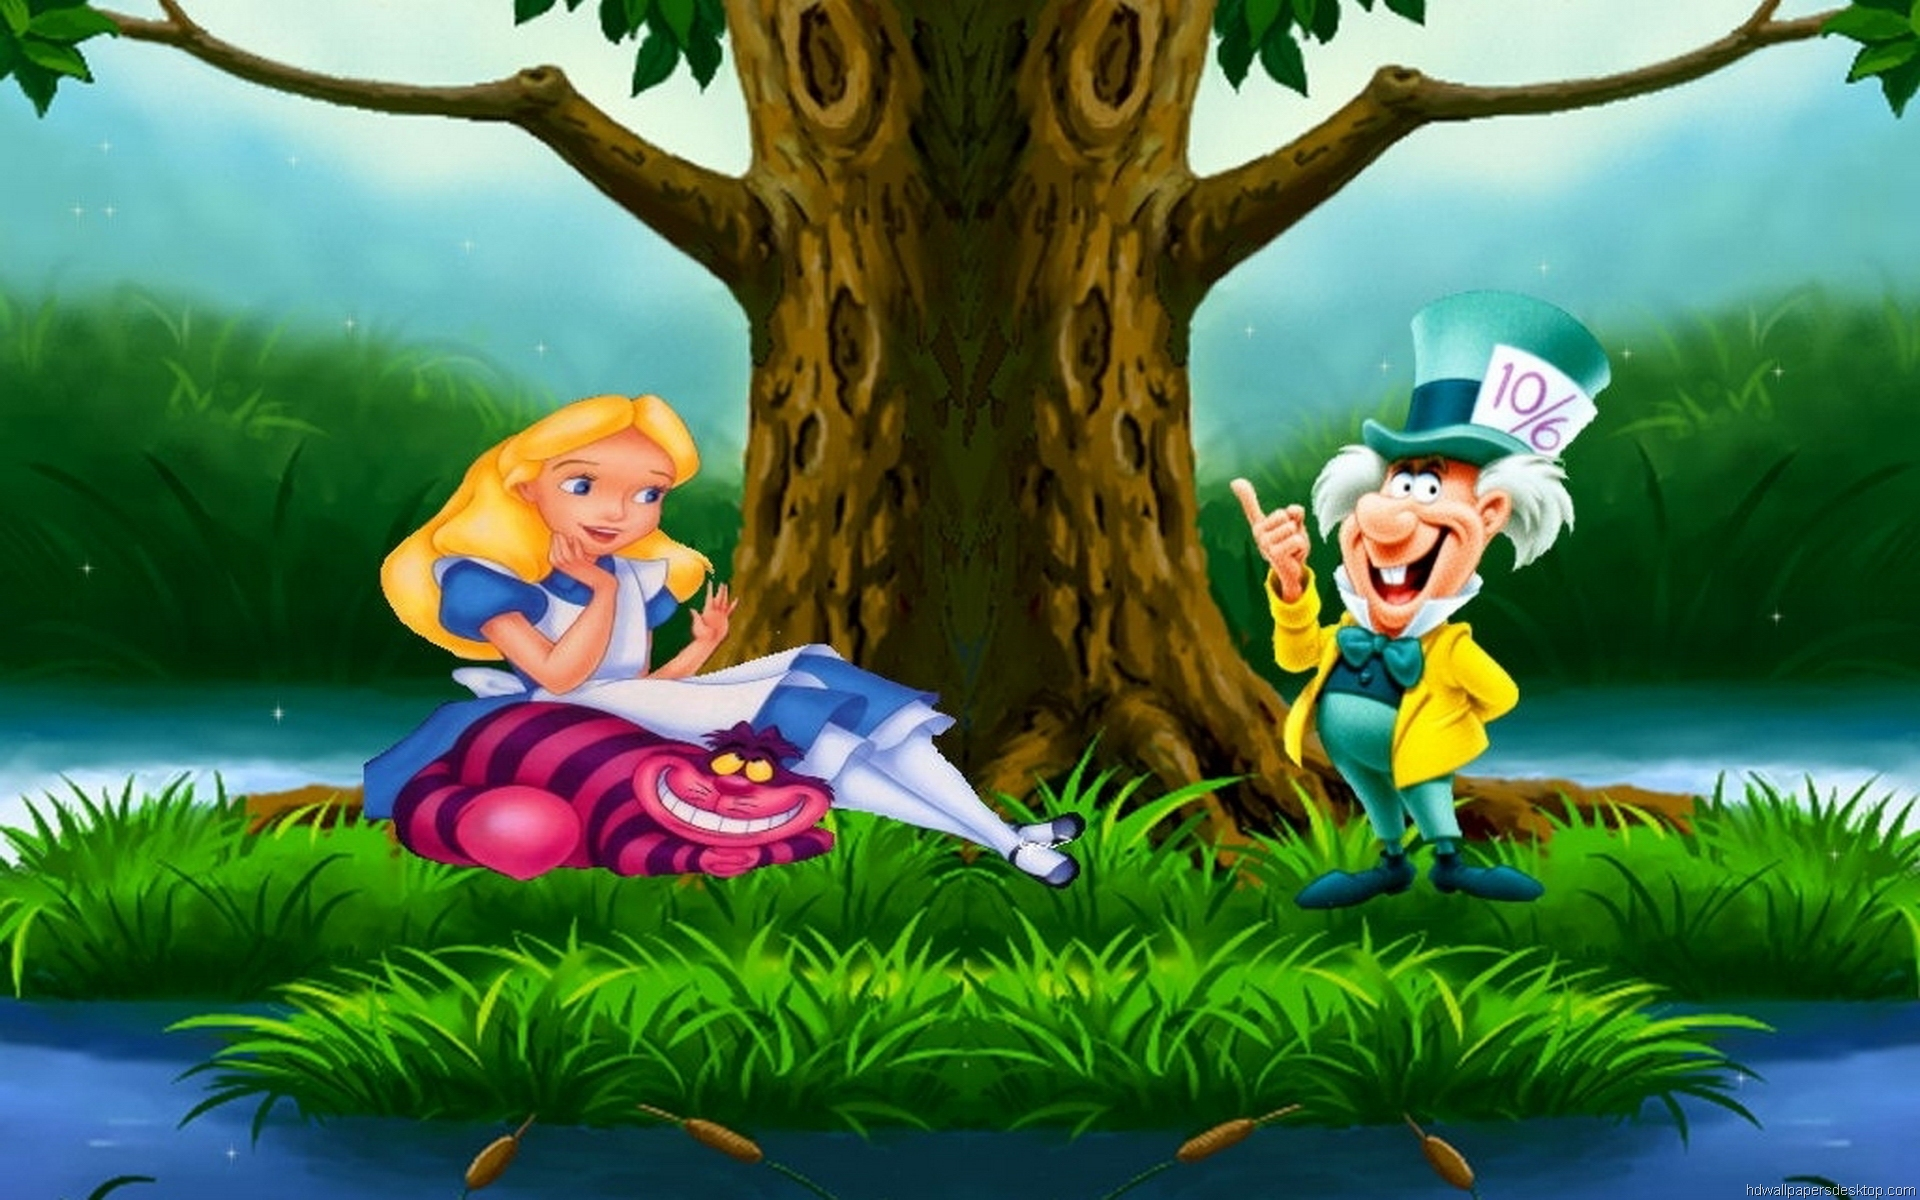 Cartoon Characters Background : Cartoon characters wallpapers for desktop wallpapersafari